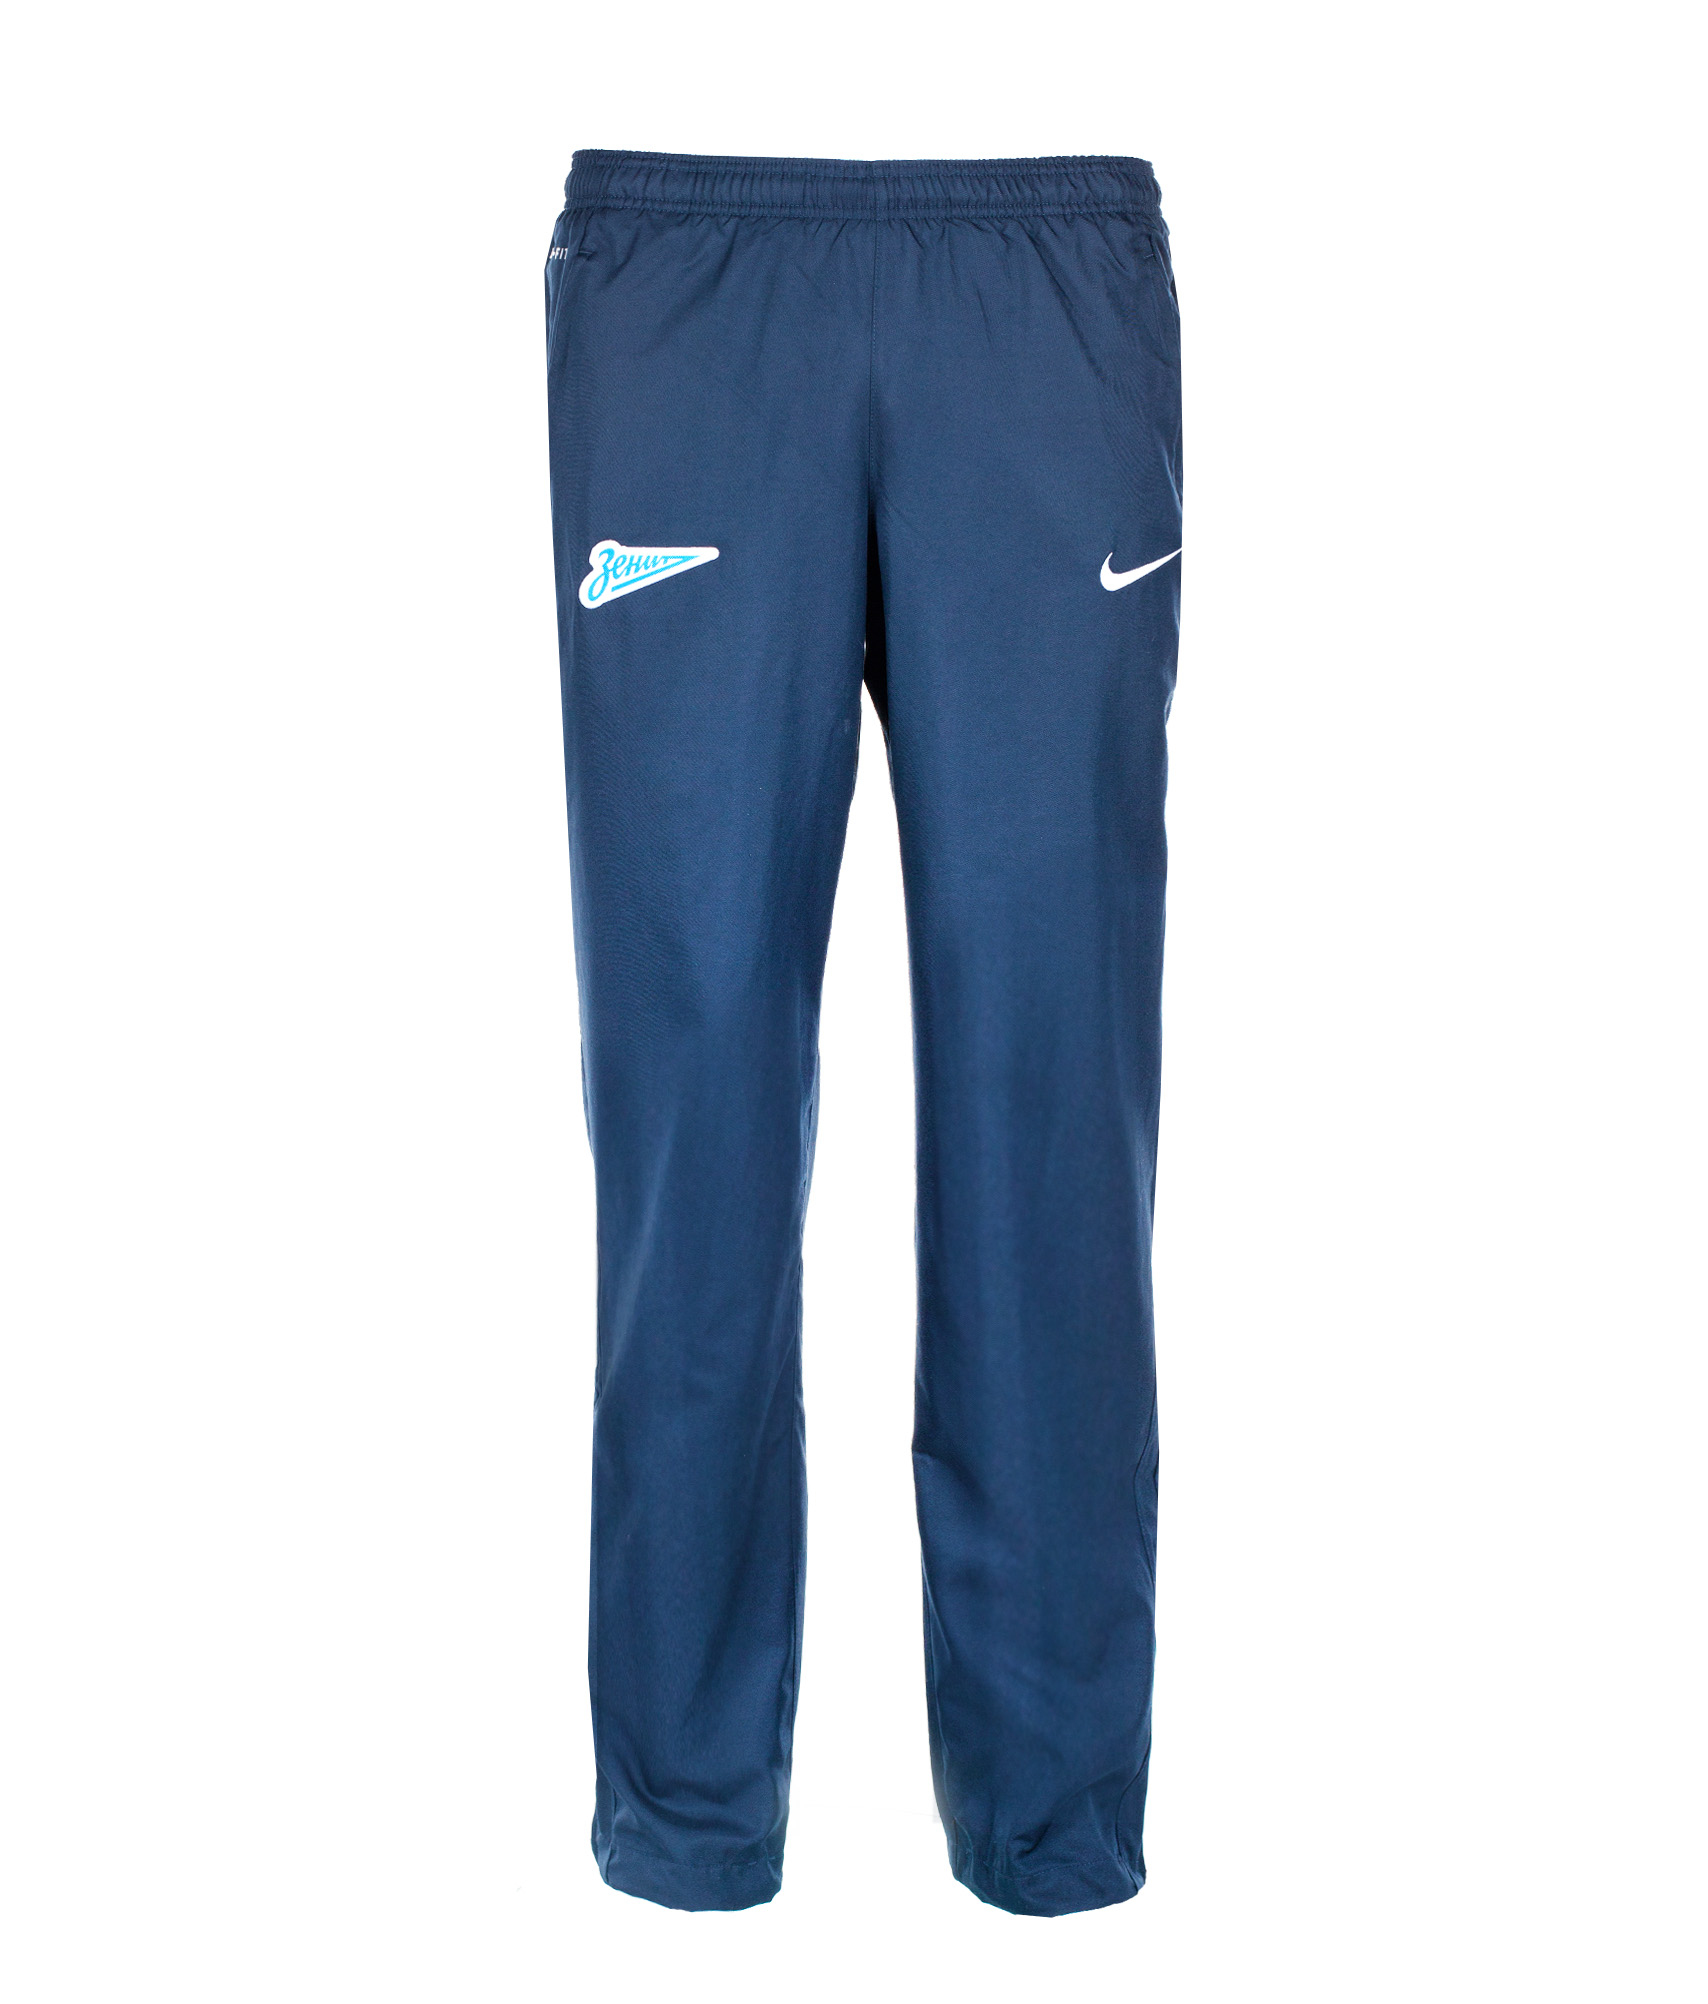 Брюки Nike Zenit Select Sdln WVN Pant, Цвет-Синий, Размер-S